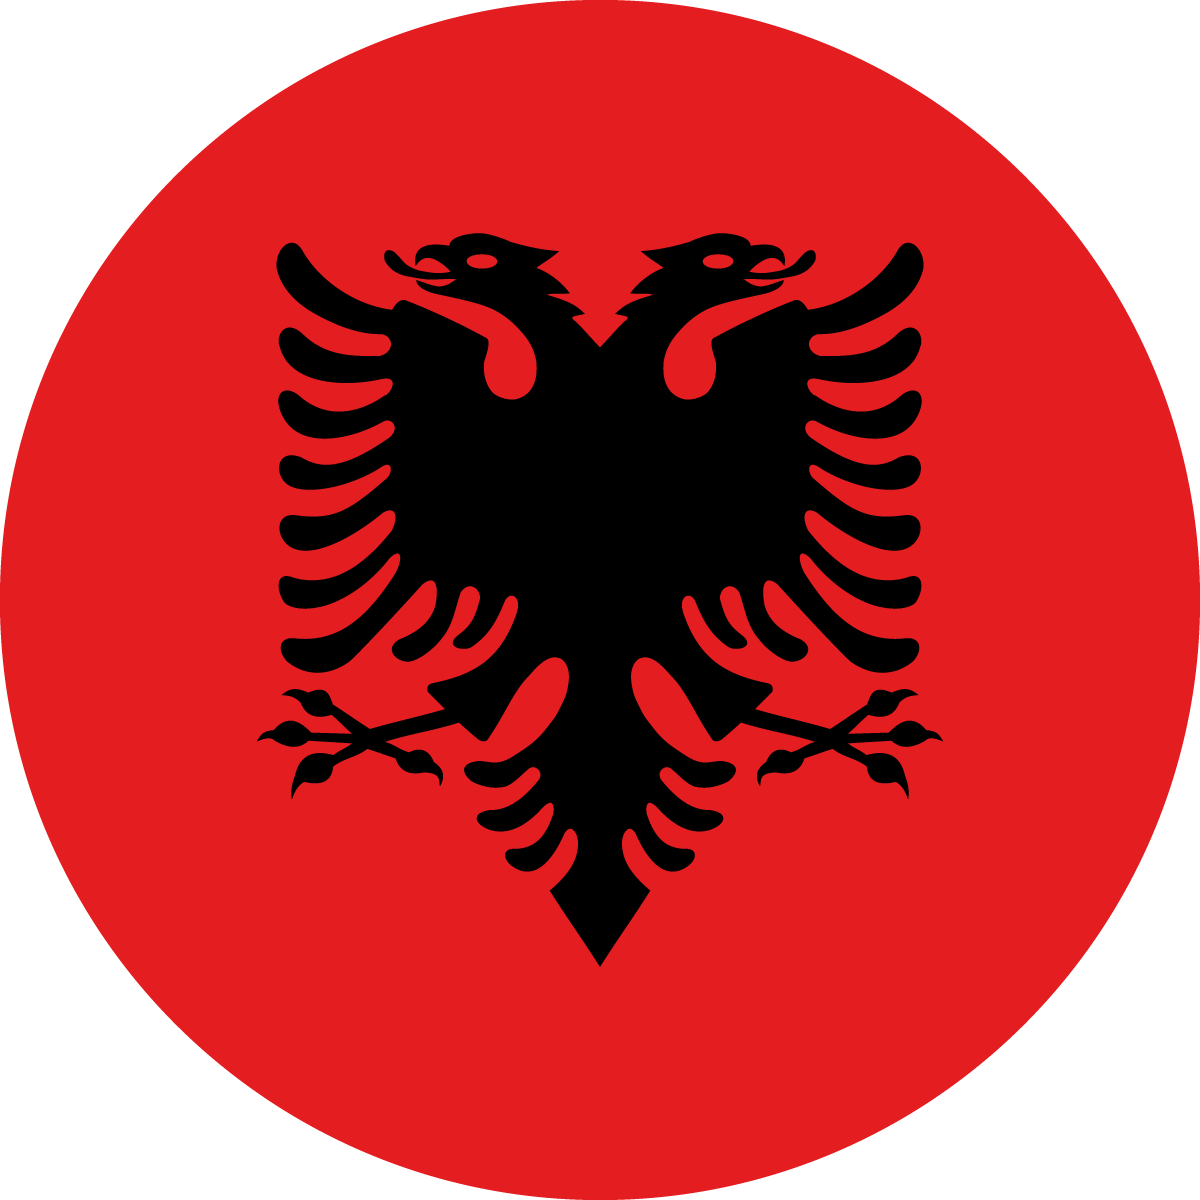 Copy of Copy of Copy of Copy of Copy of Copy of Copy of Copy of Copy of Copy of Copy of Albania